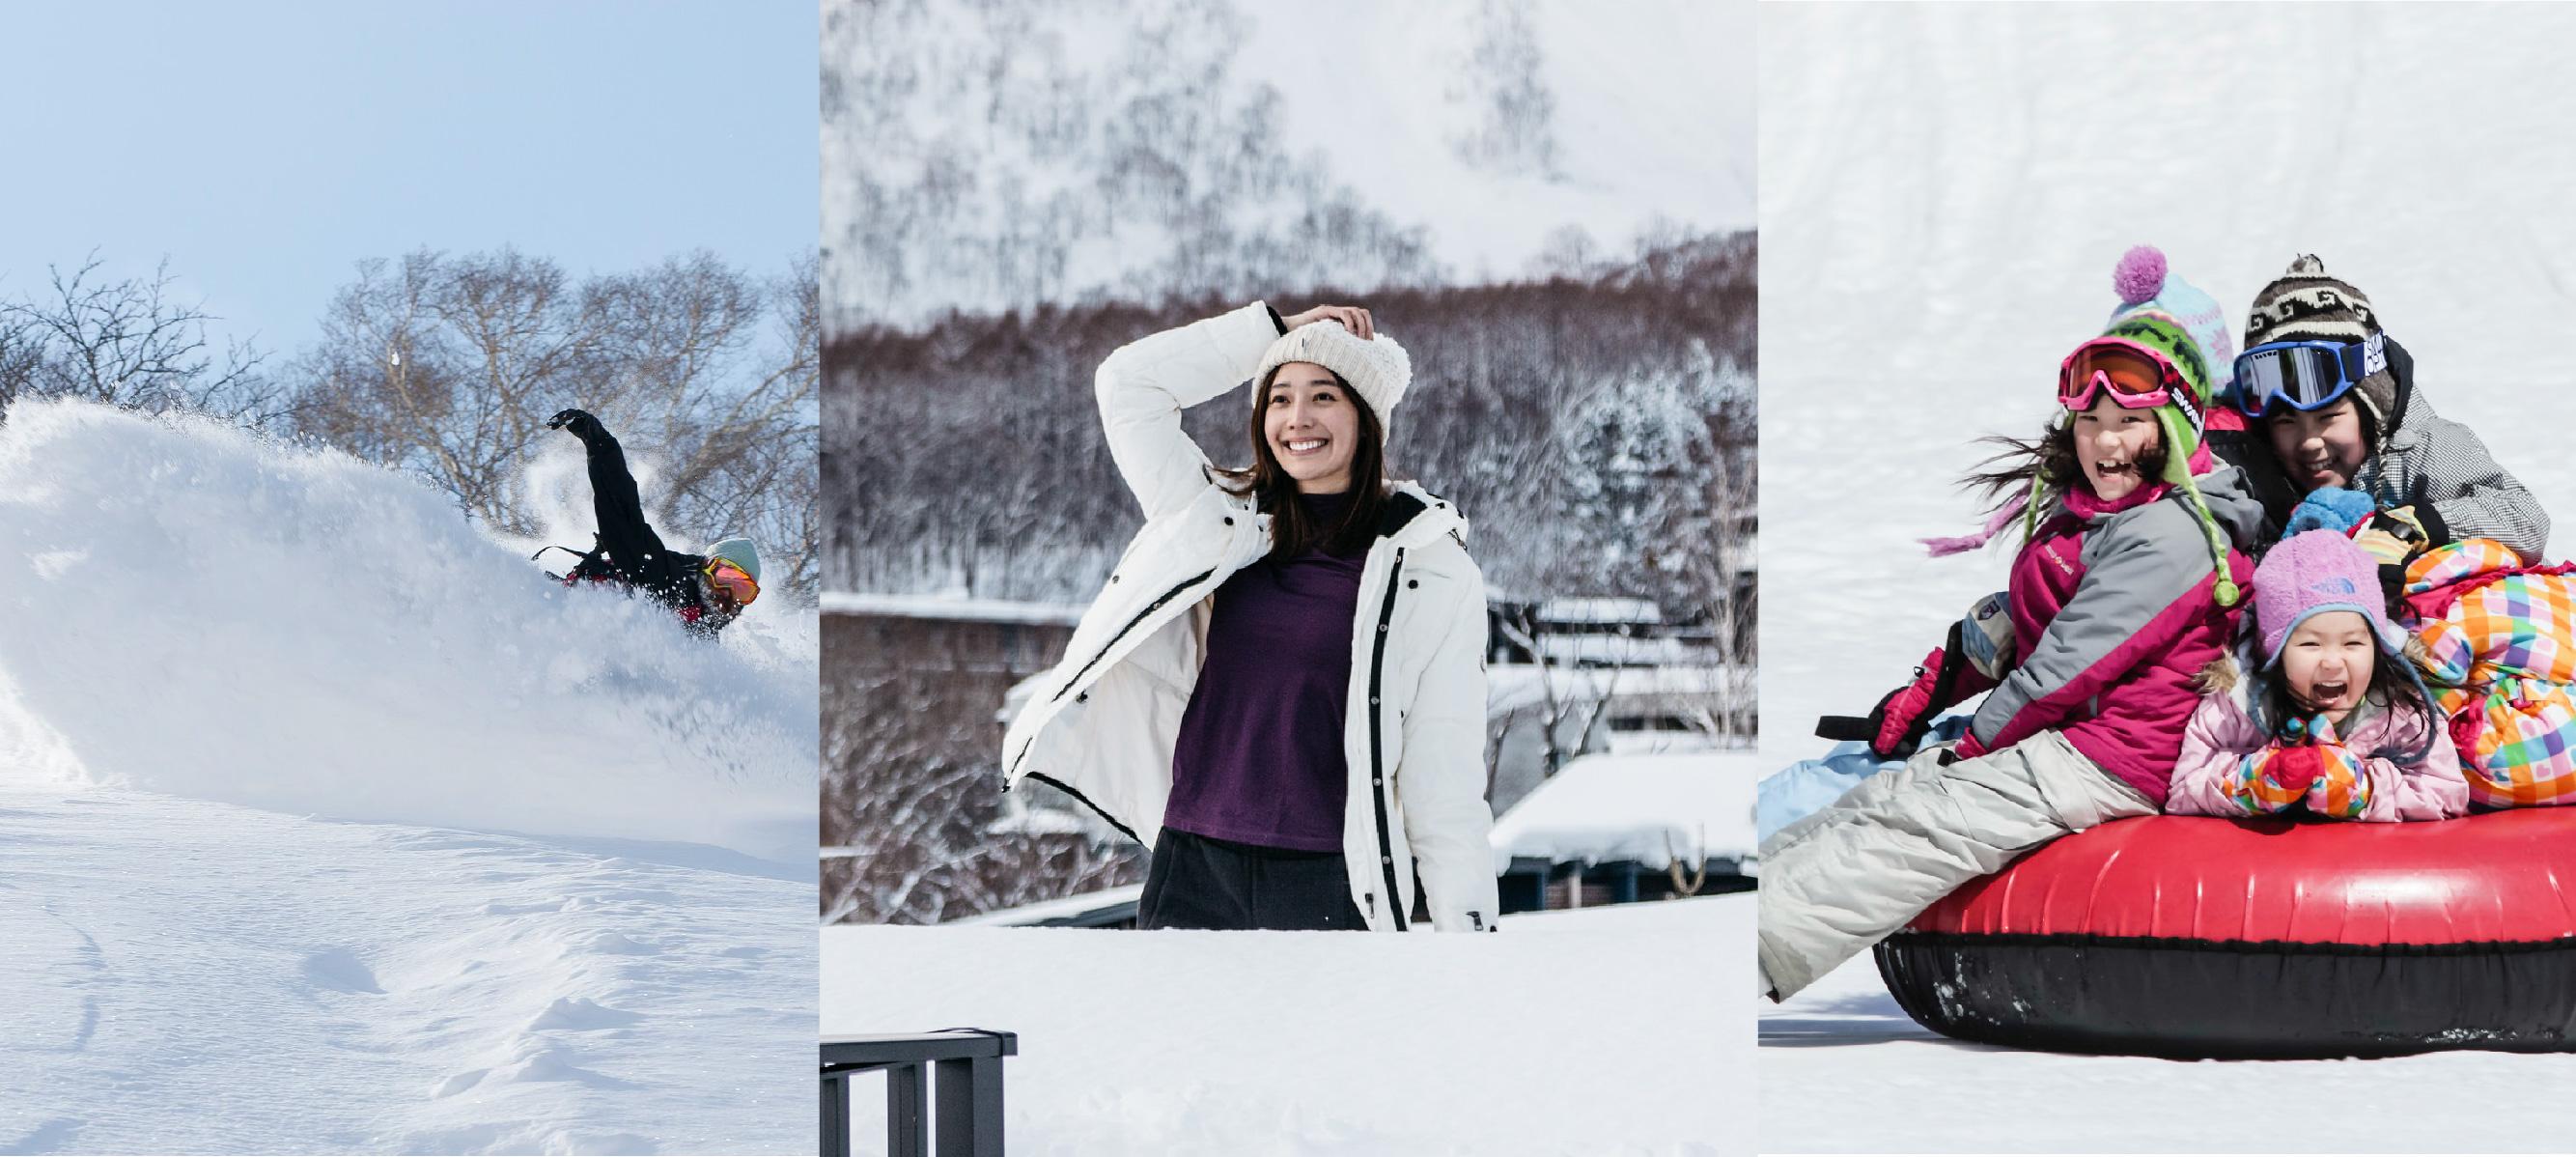 go to travel campaign niseko hokkaido